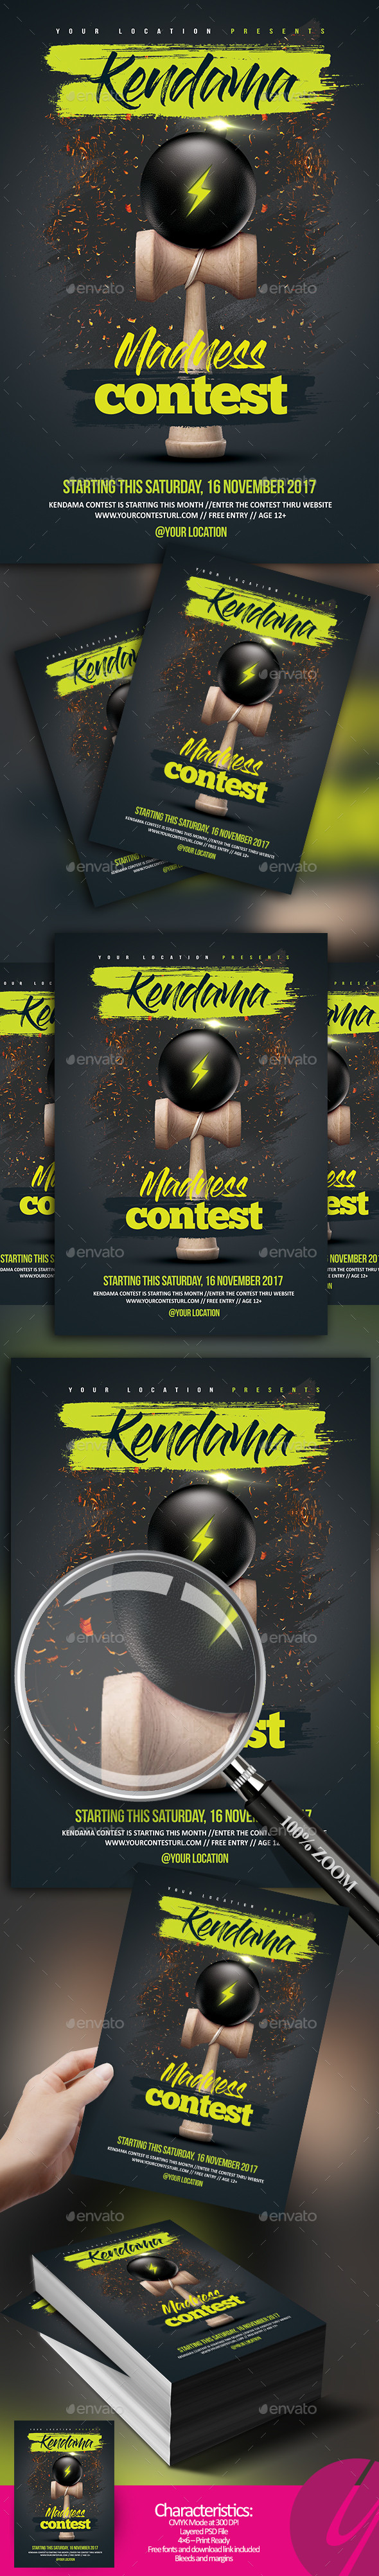 Kendama Madness Contest - Sports Events